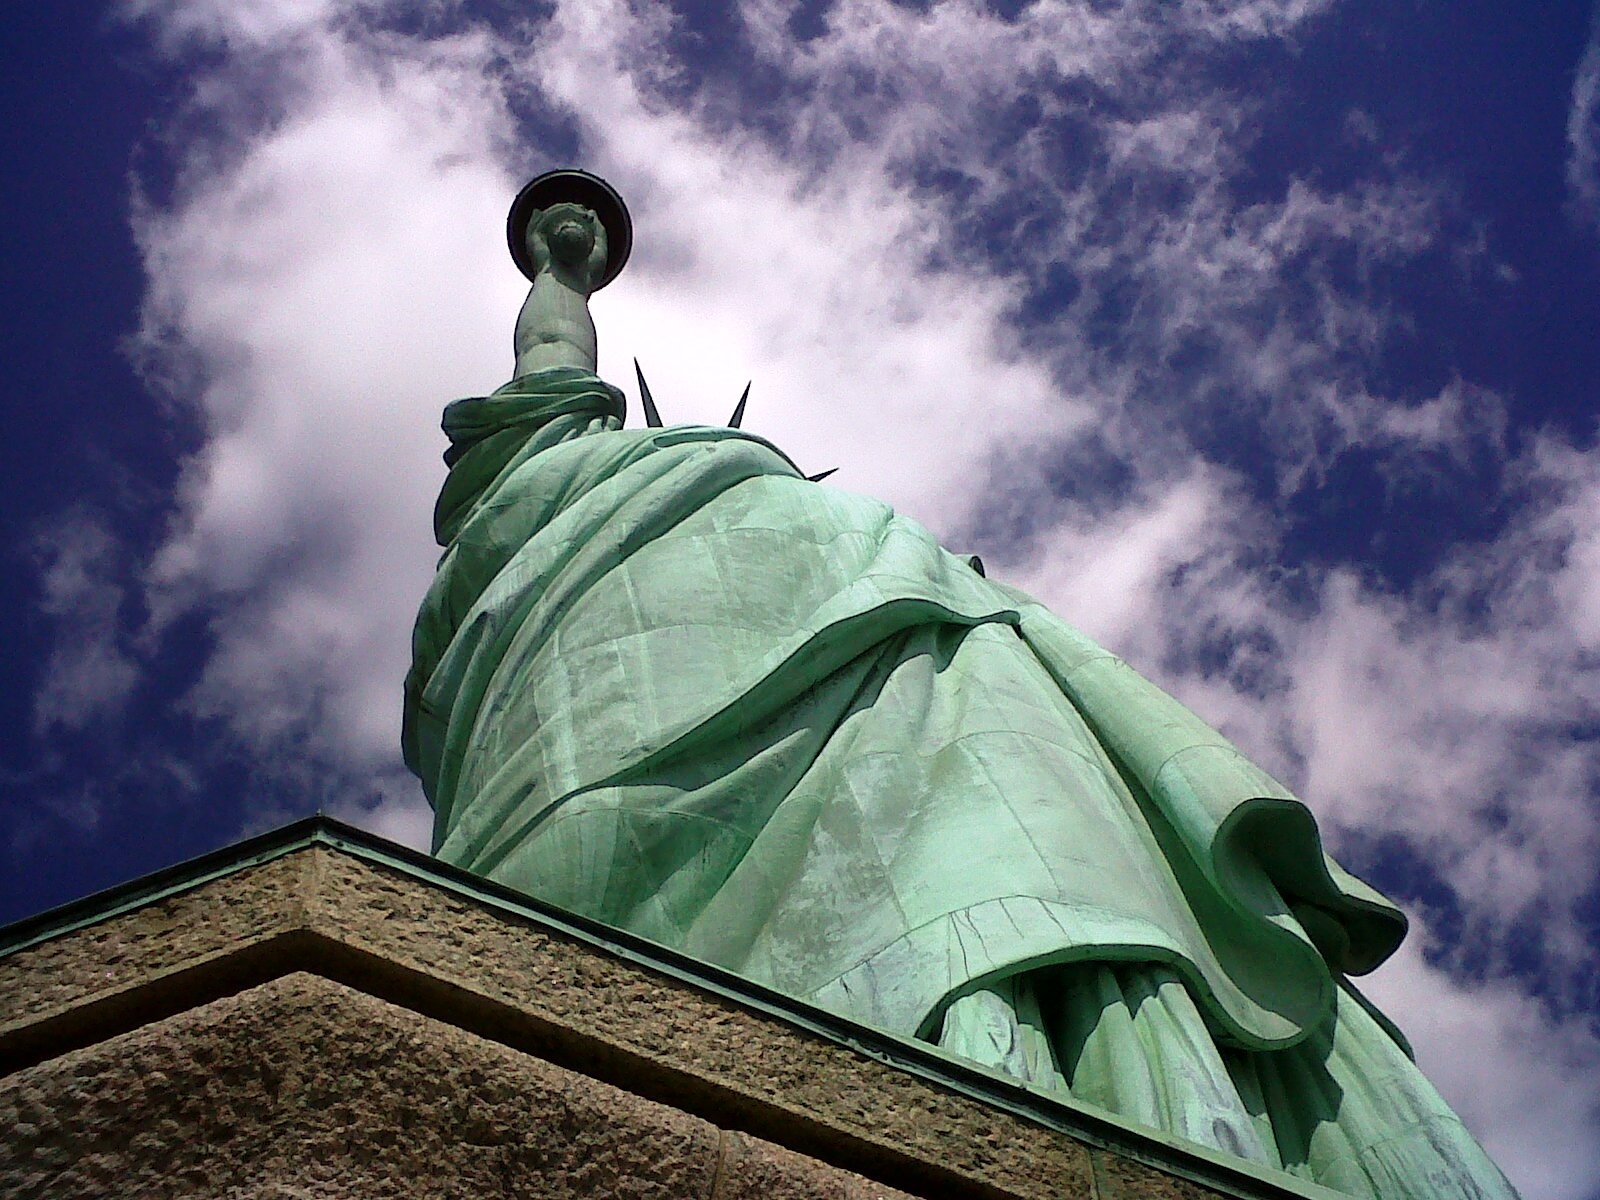 File:Statue of Liberty 2011 from pedestal.jpg - Wikimedia